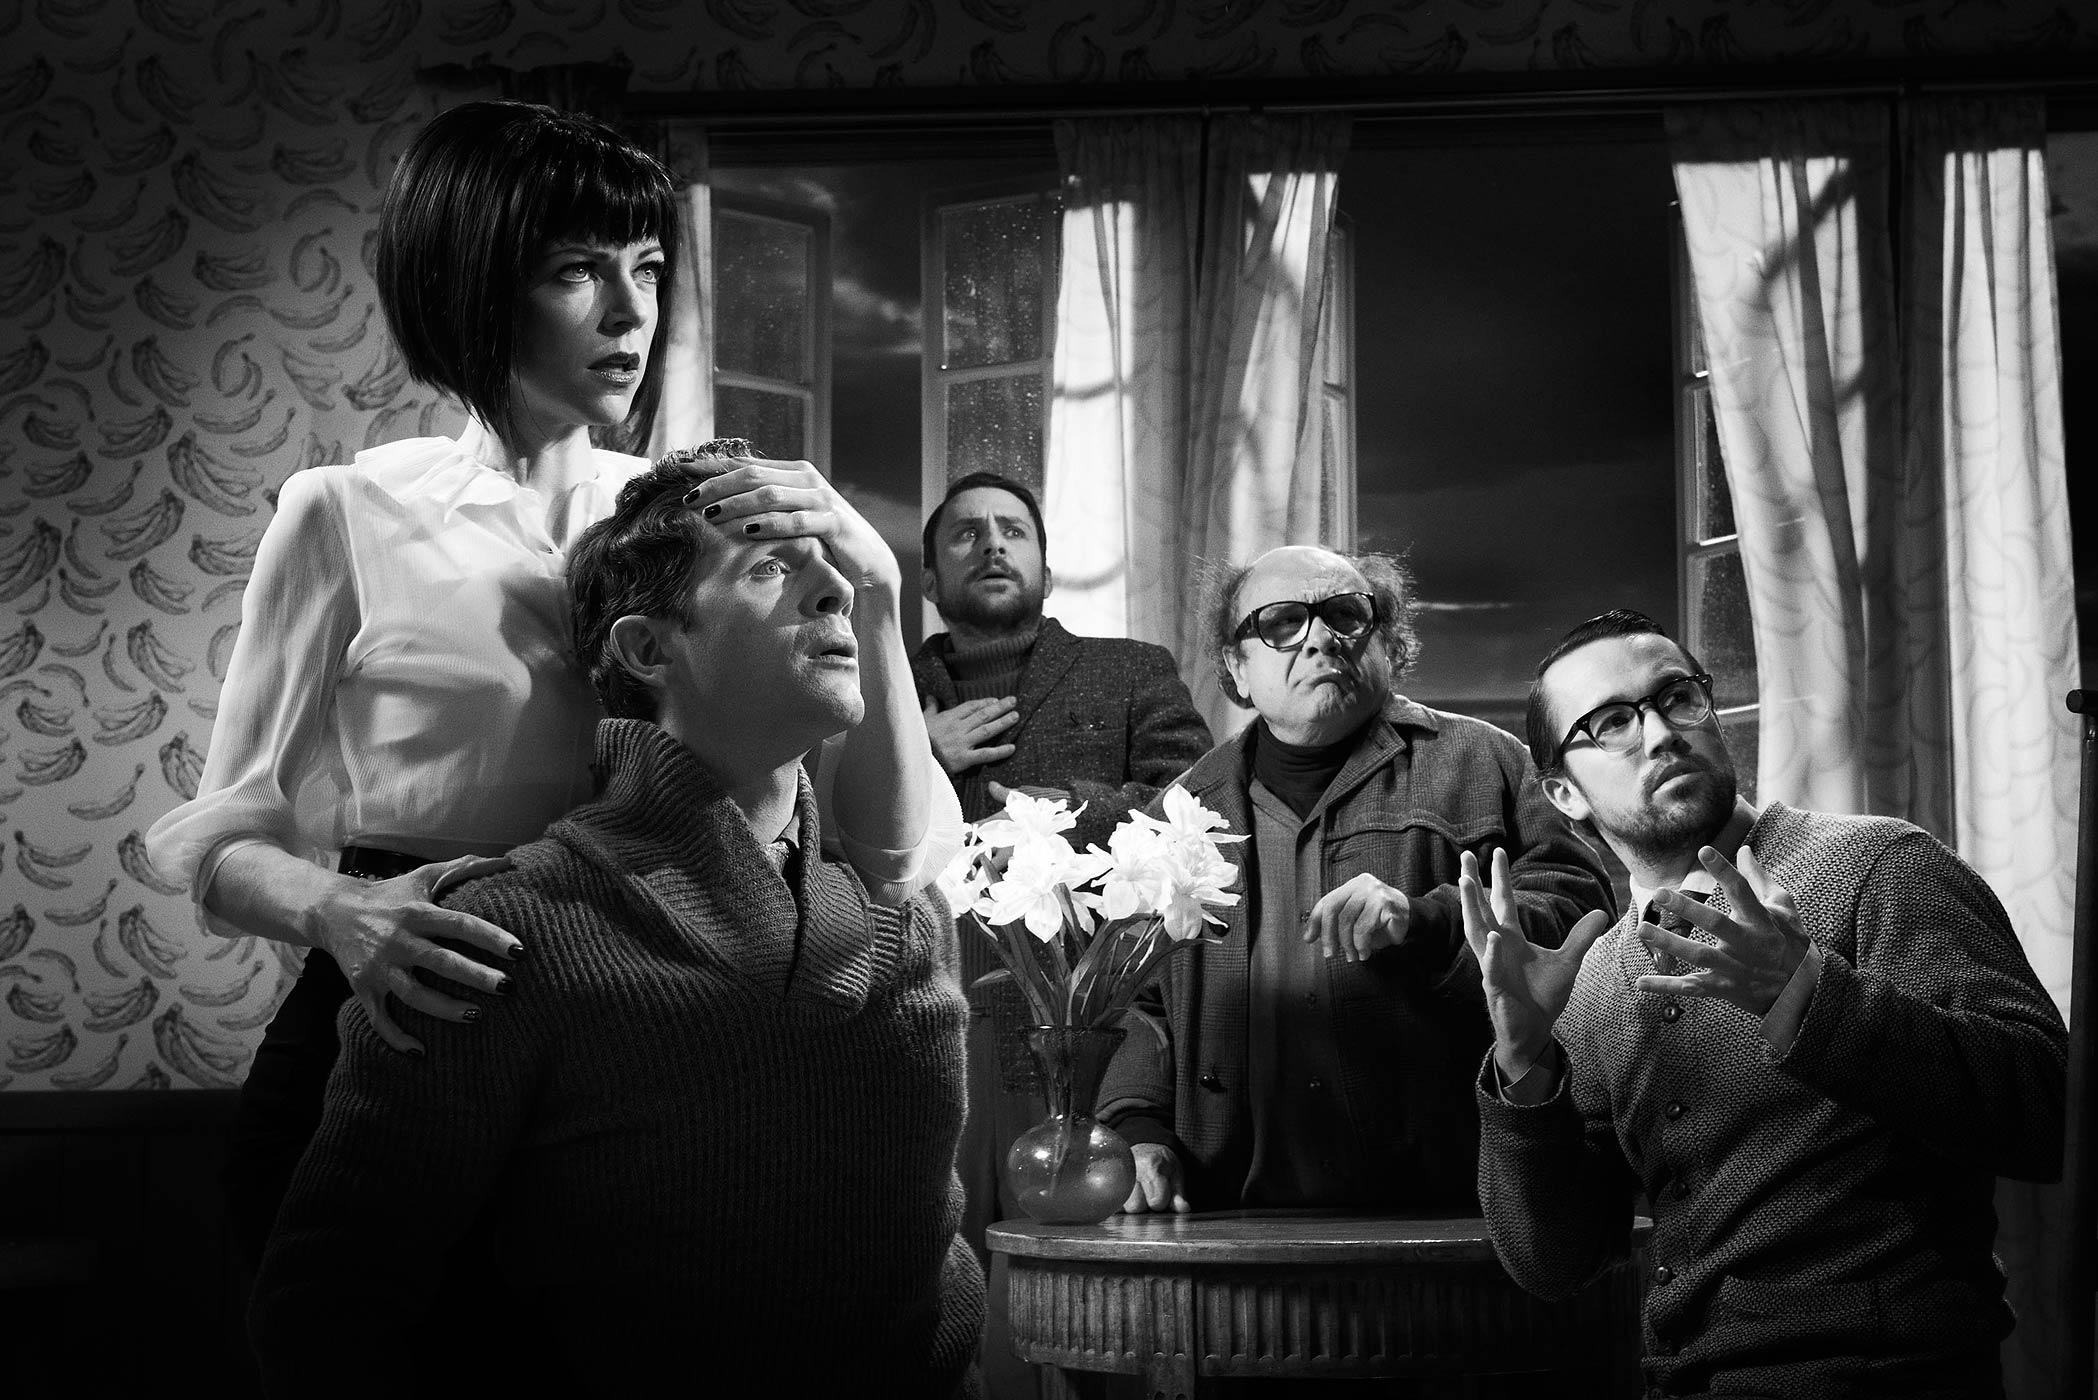 From left: Kaitlin Olson as Dee Reynolds, Glenn Howerton as Dennis Reynolds, Charlie Day as Charlie Kelly, Danny DeVito as Frank Reynolds and Rob McElhenney as Mac in It's Always Sunny In Philadelphia